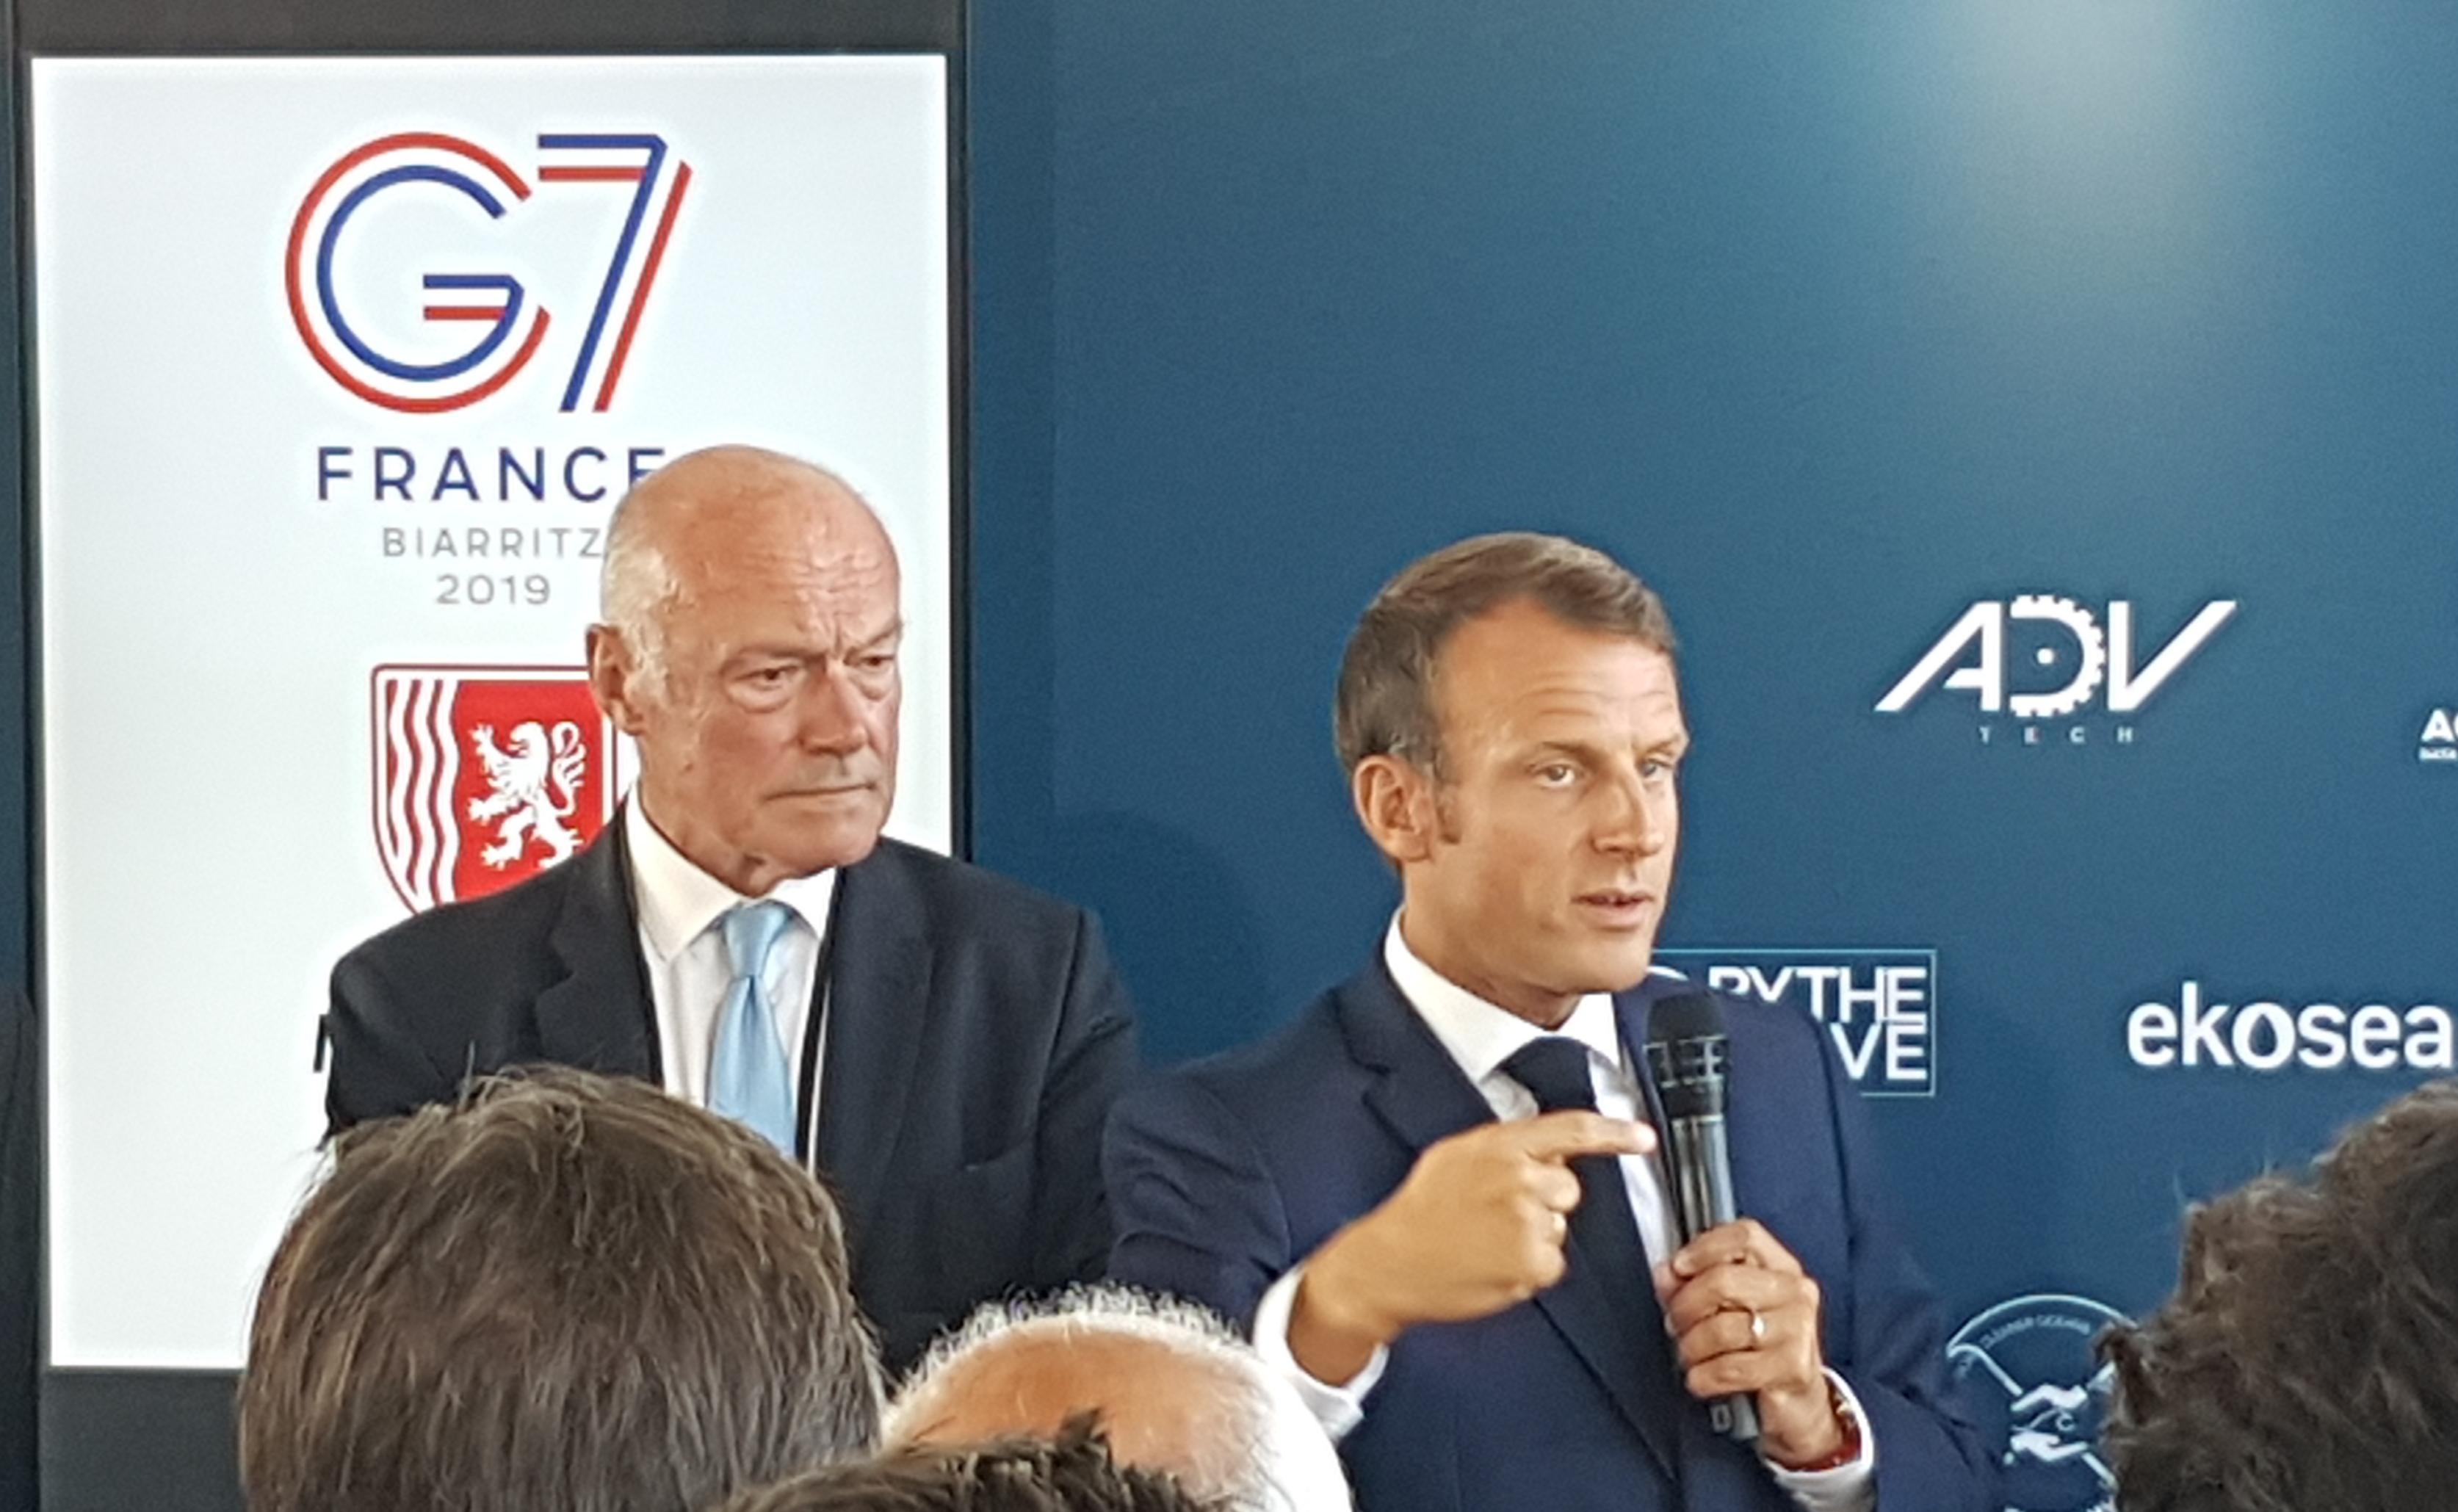 Advtech, photo G7 Biarritz 2019